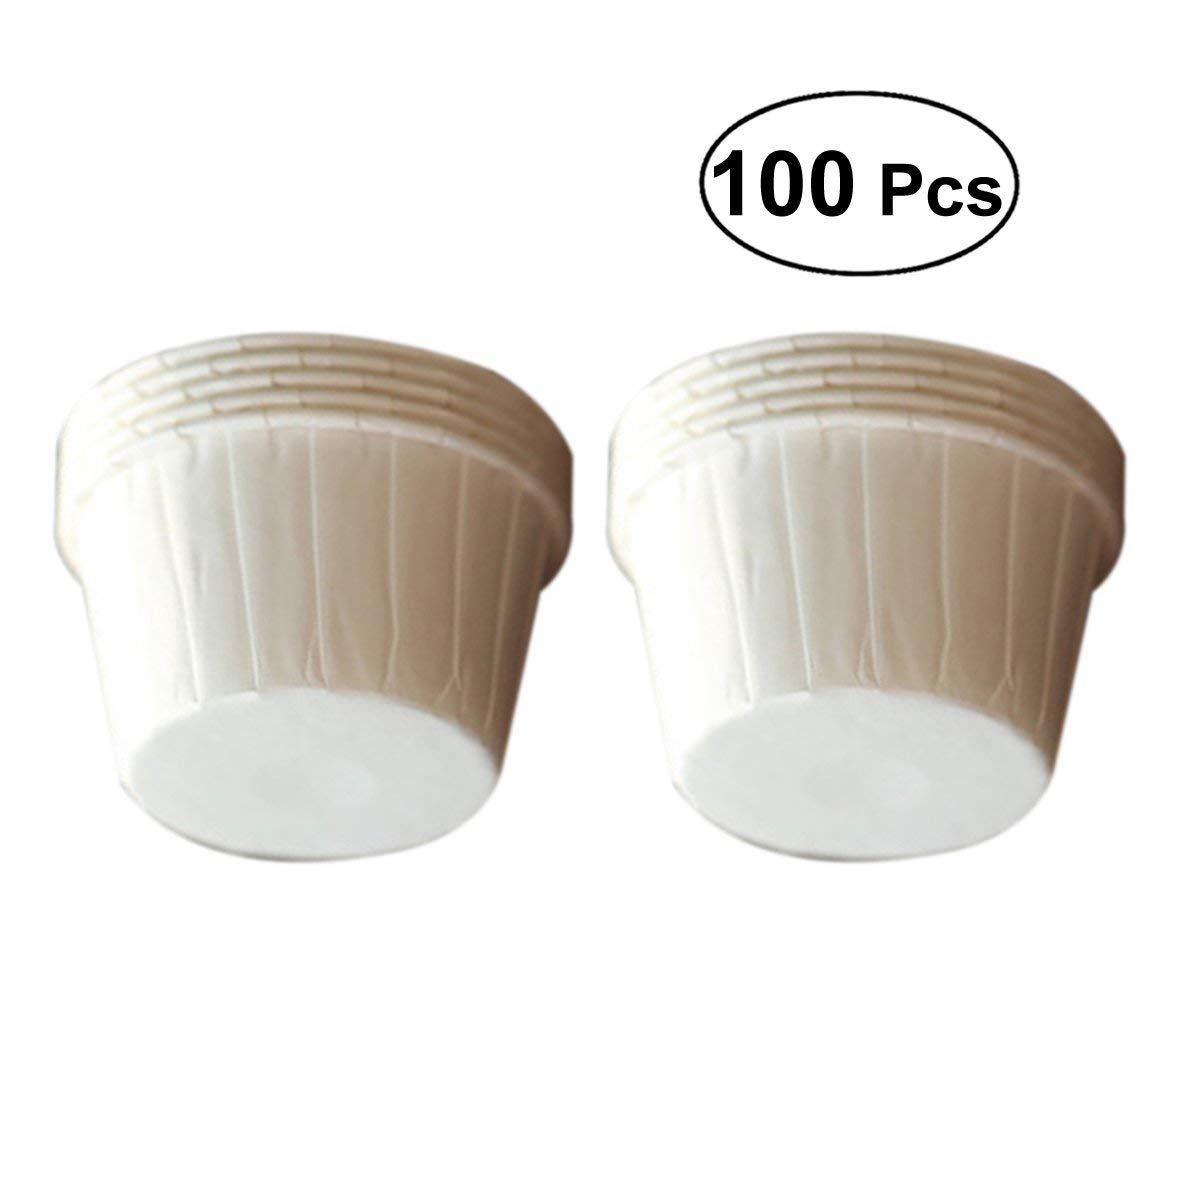 bestonzon 100/pure wei/ß Cupcake-Backf/örmchen Muffin Wrapper-Liners Kuchen F/ällen Form